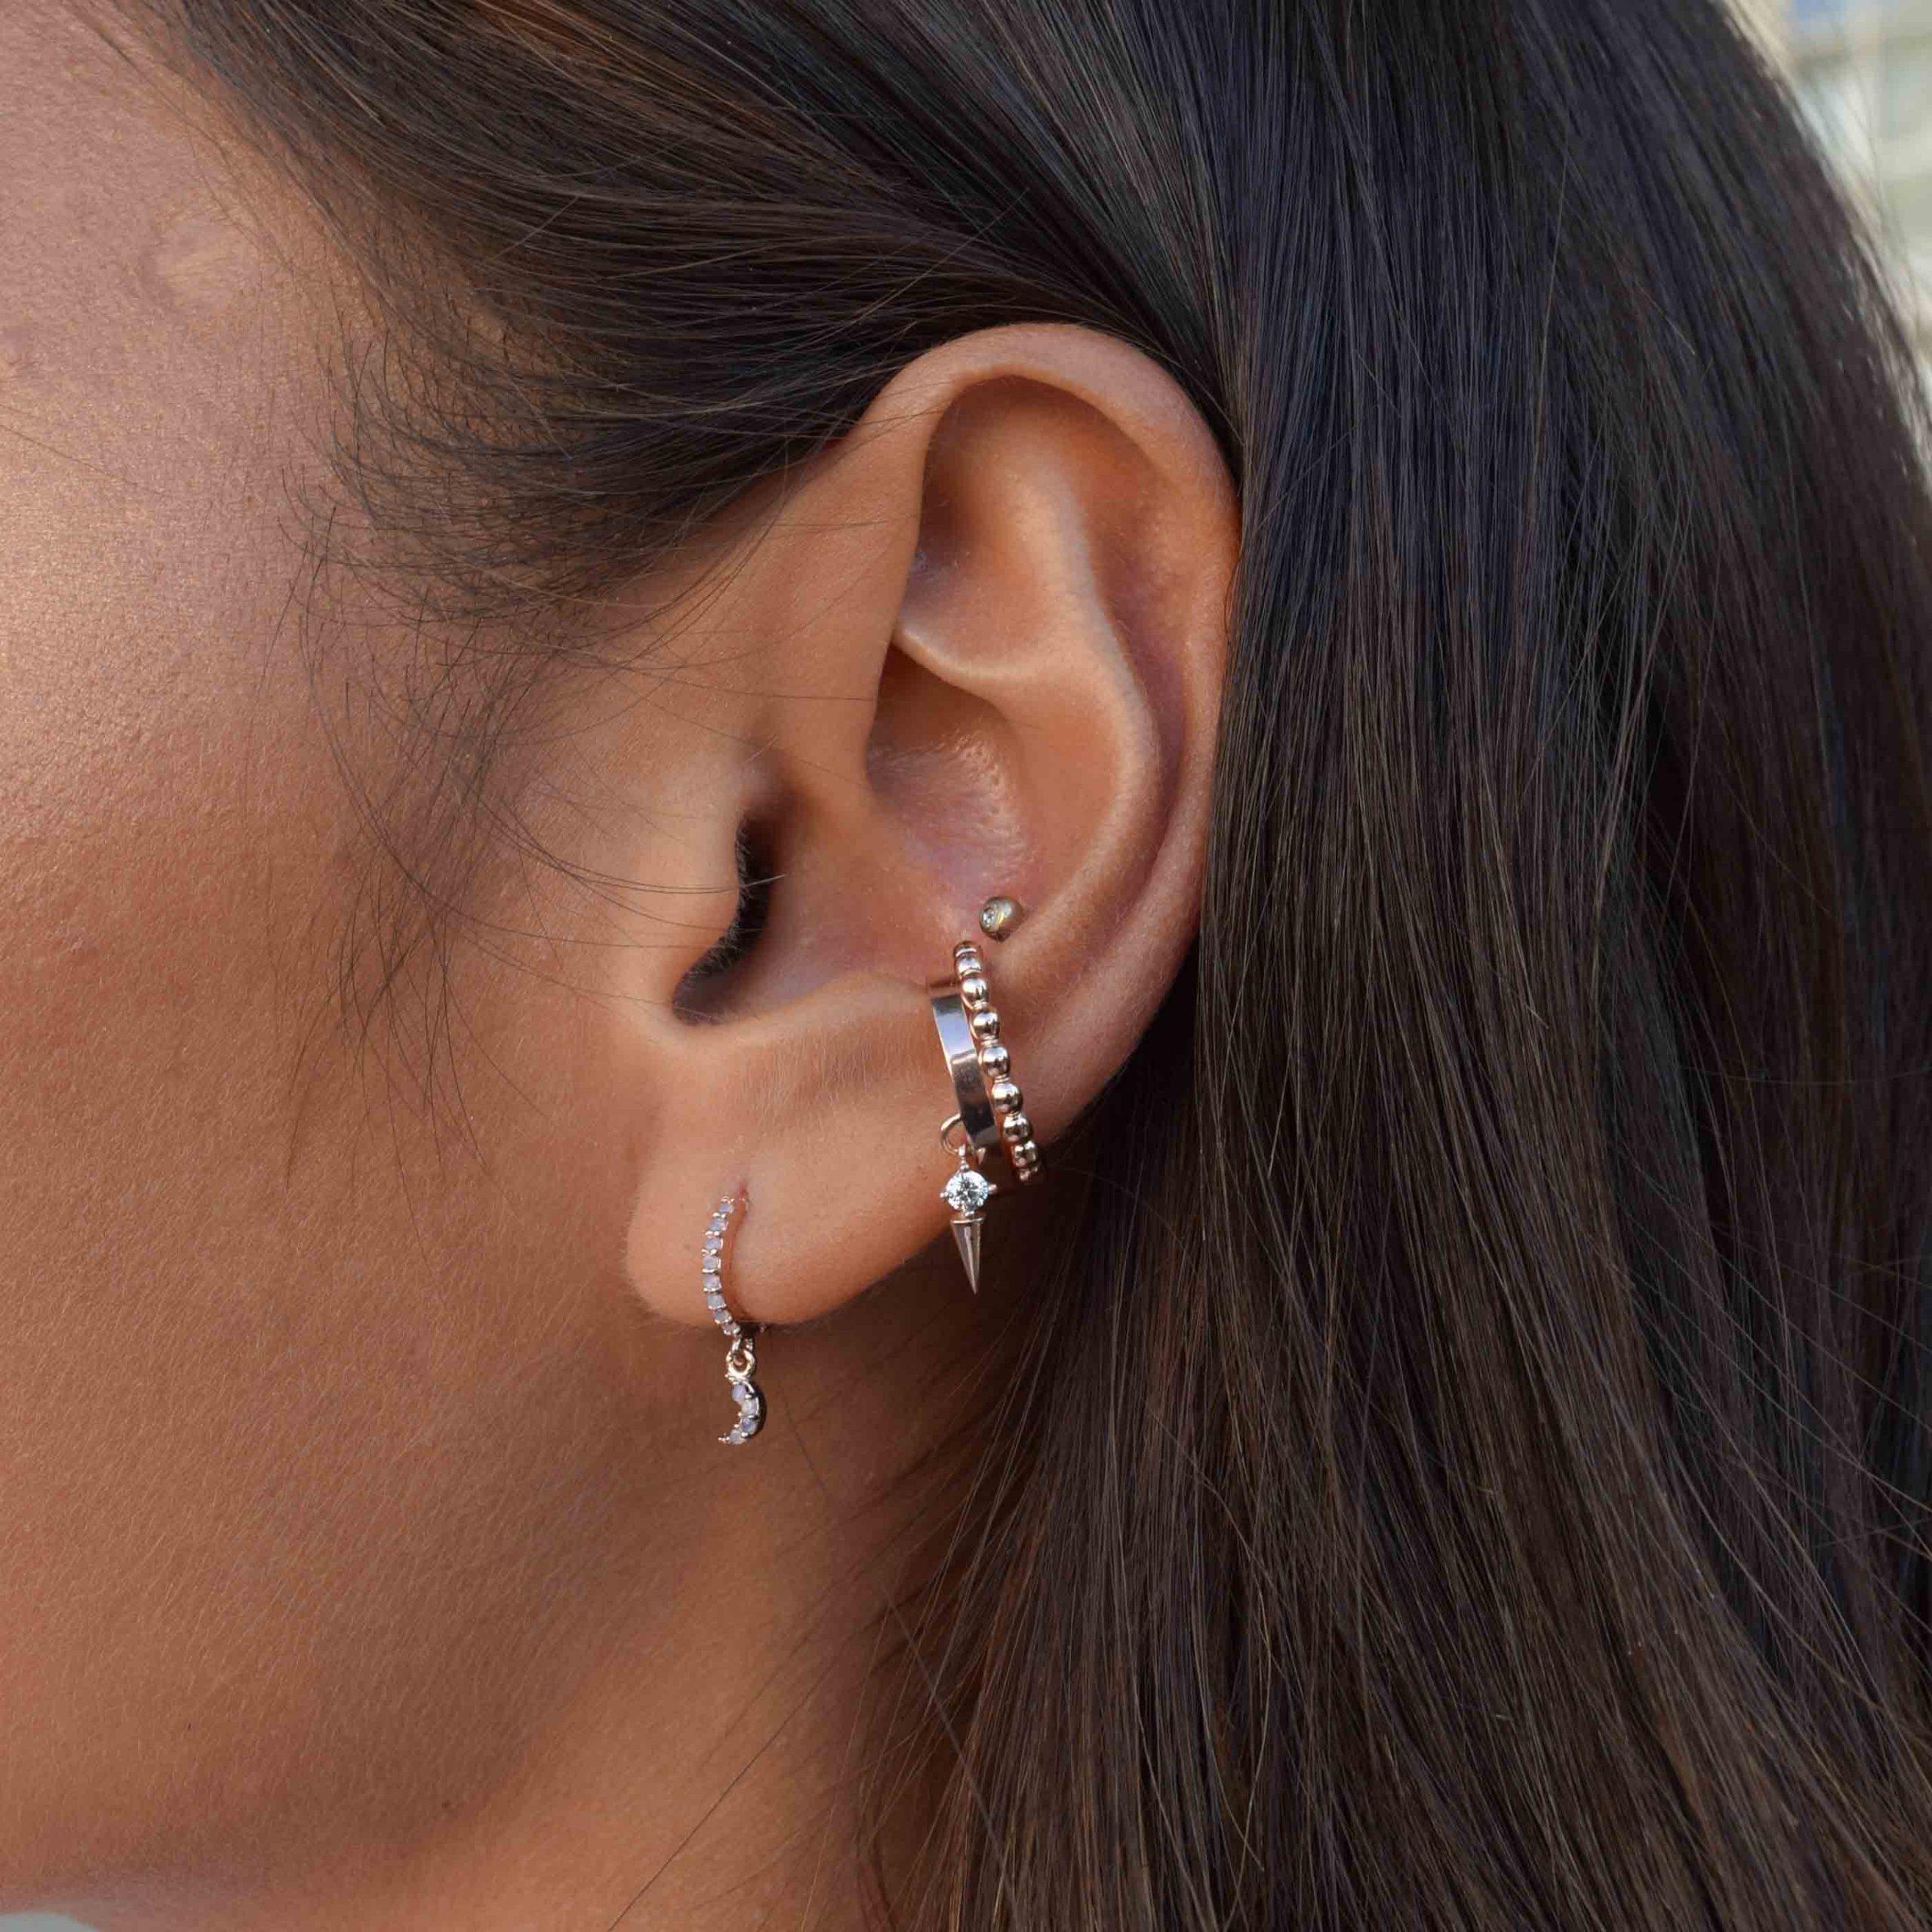 BASIC BEADED EAR CUFF ROSE GOLD